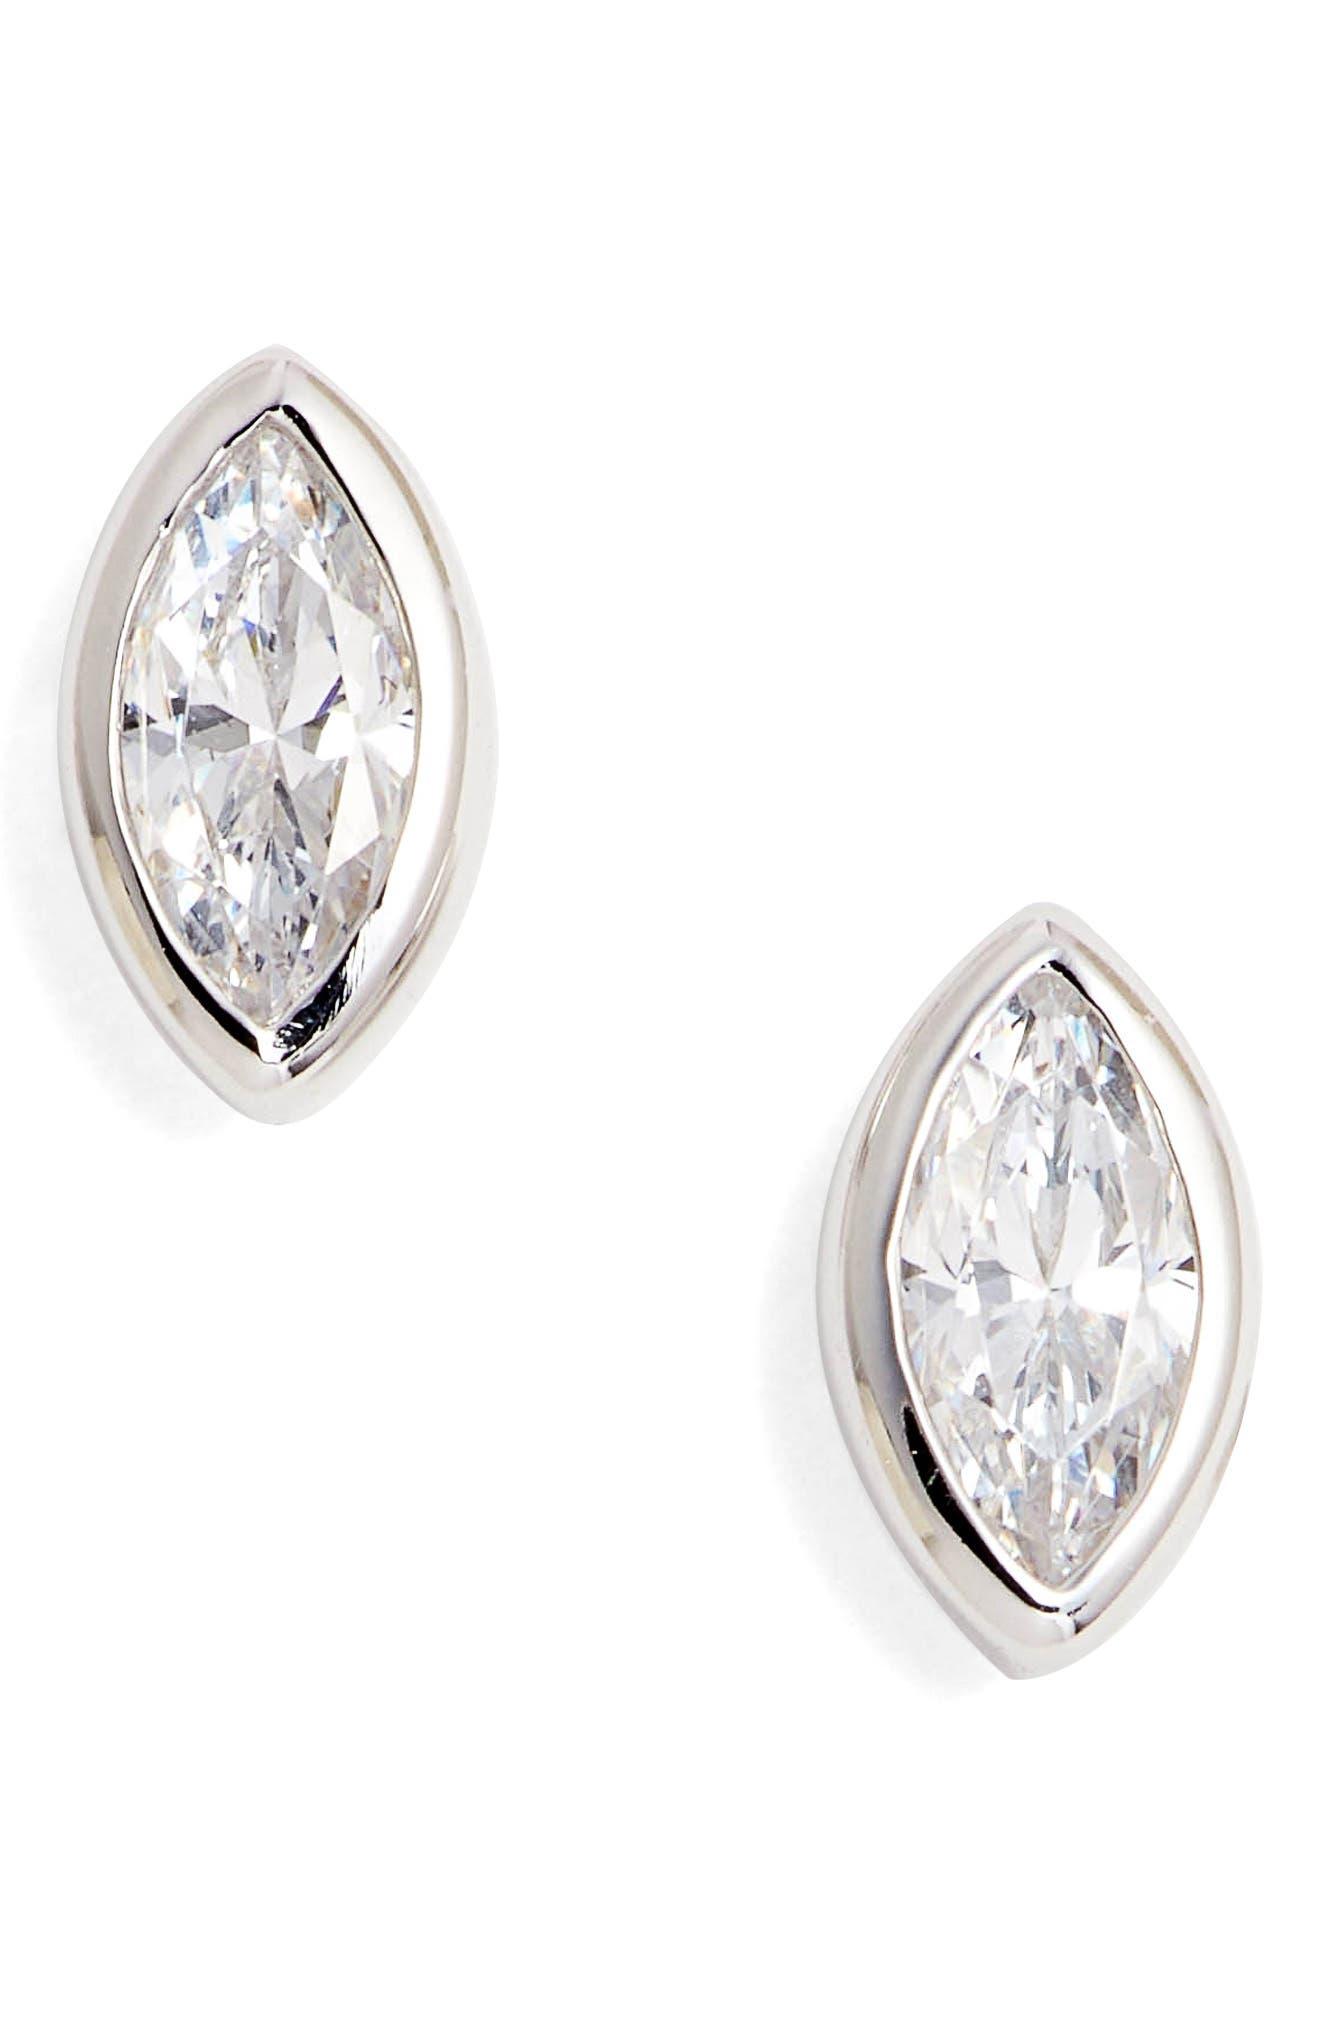 Bezel-Set Marquise-Cut Stud Earrings,                             Main thumbnail 1, color,                             Silver/ Clear